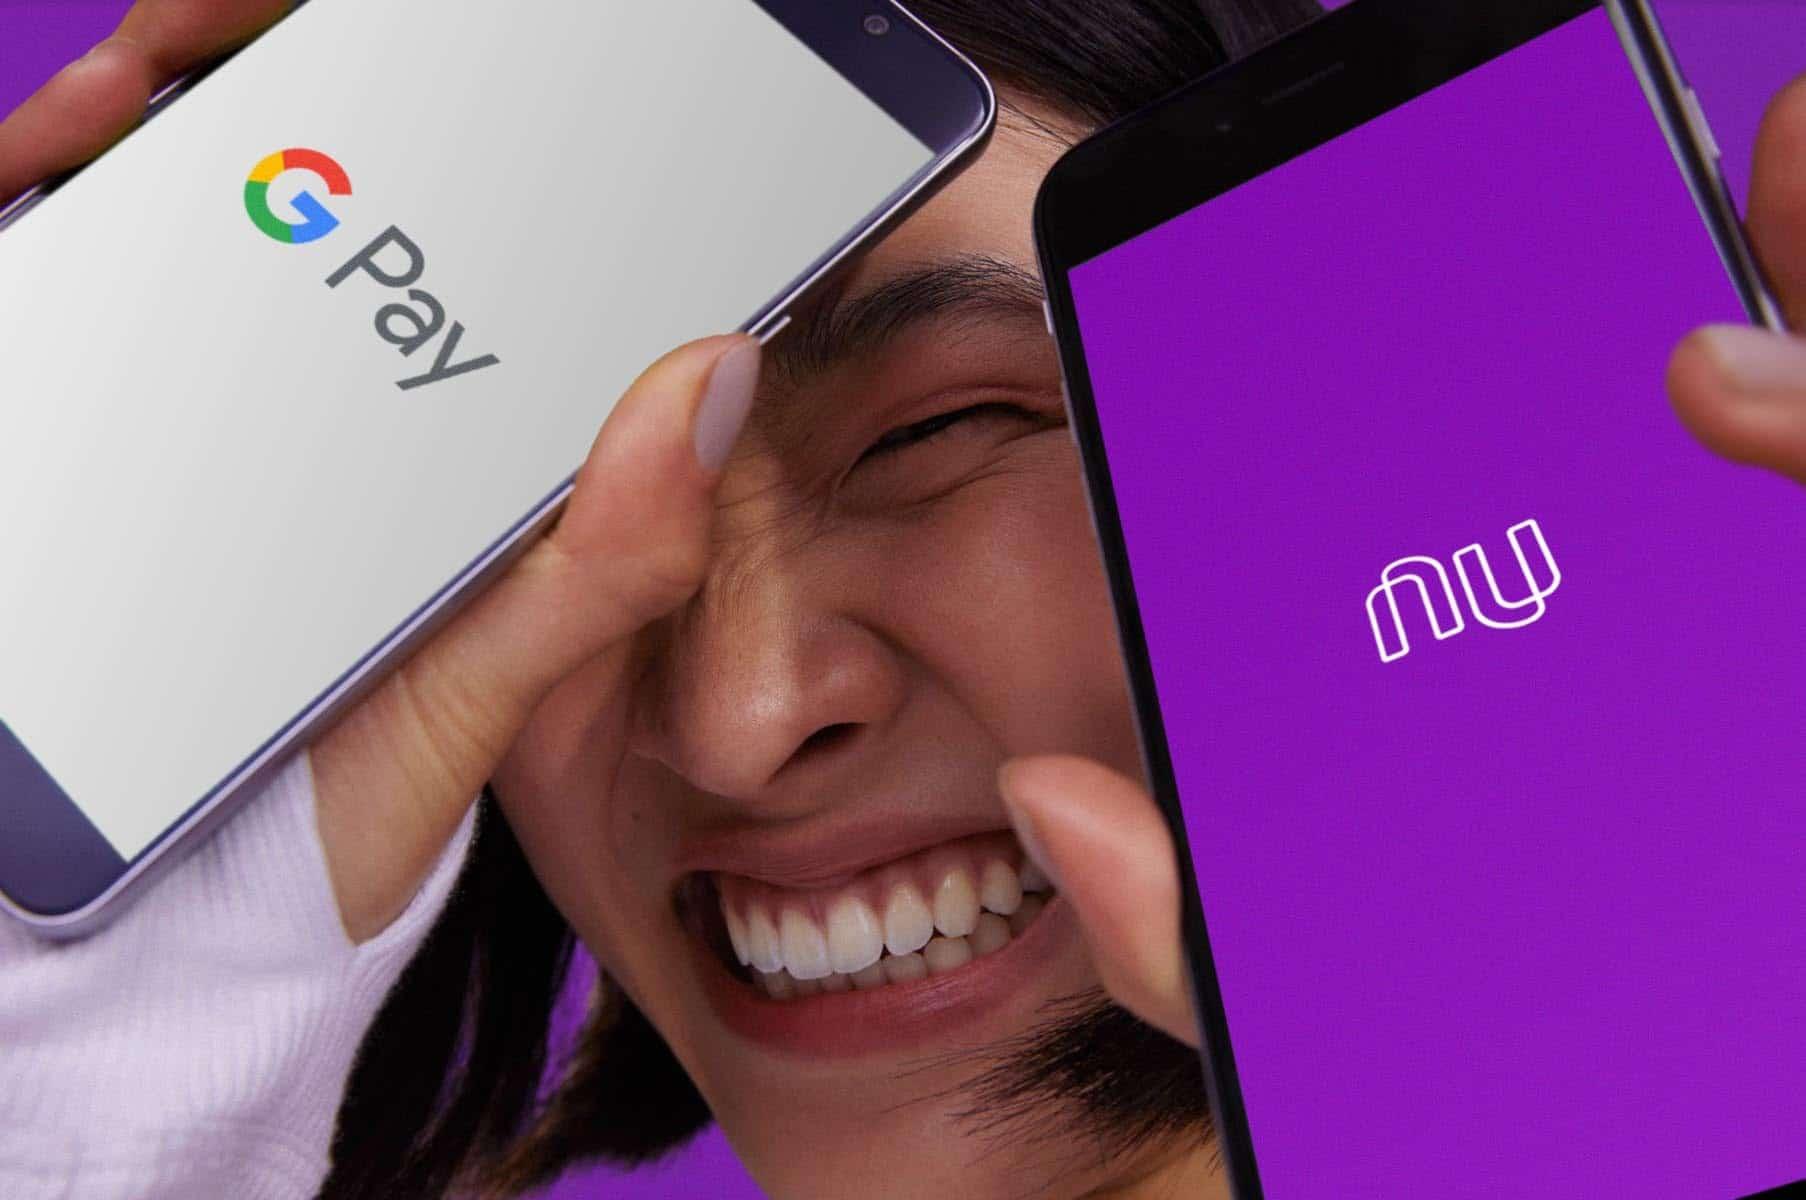 Nubank oferece conta PJ digital bastante simplificada; mas será que vale a pena?